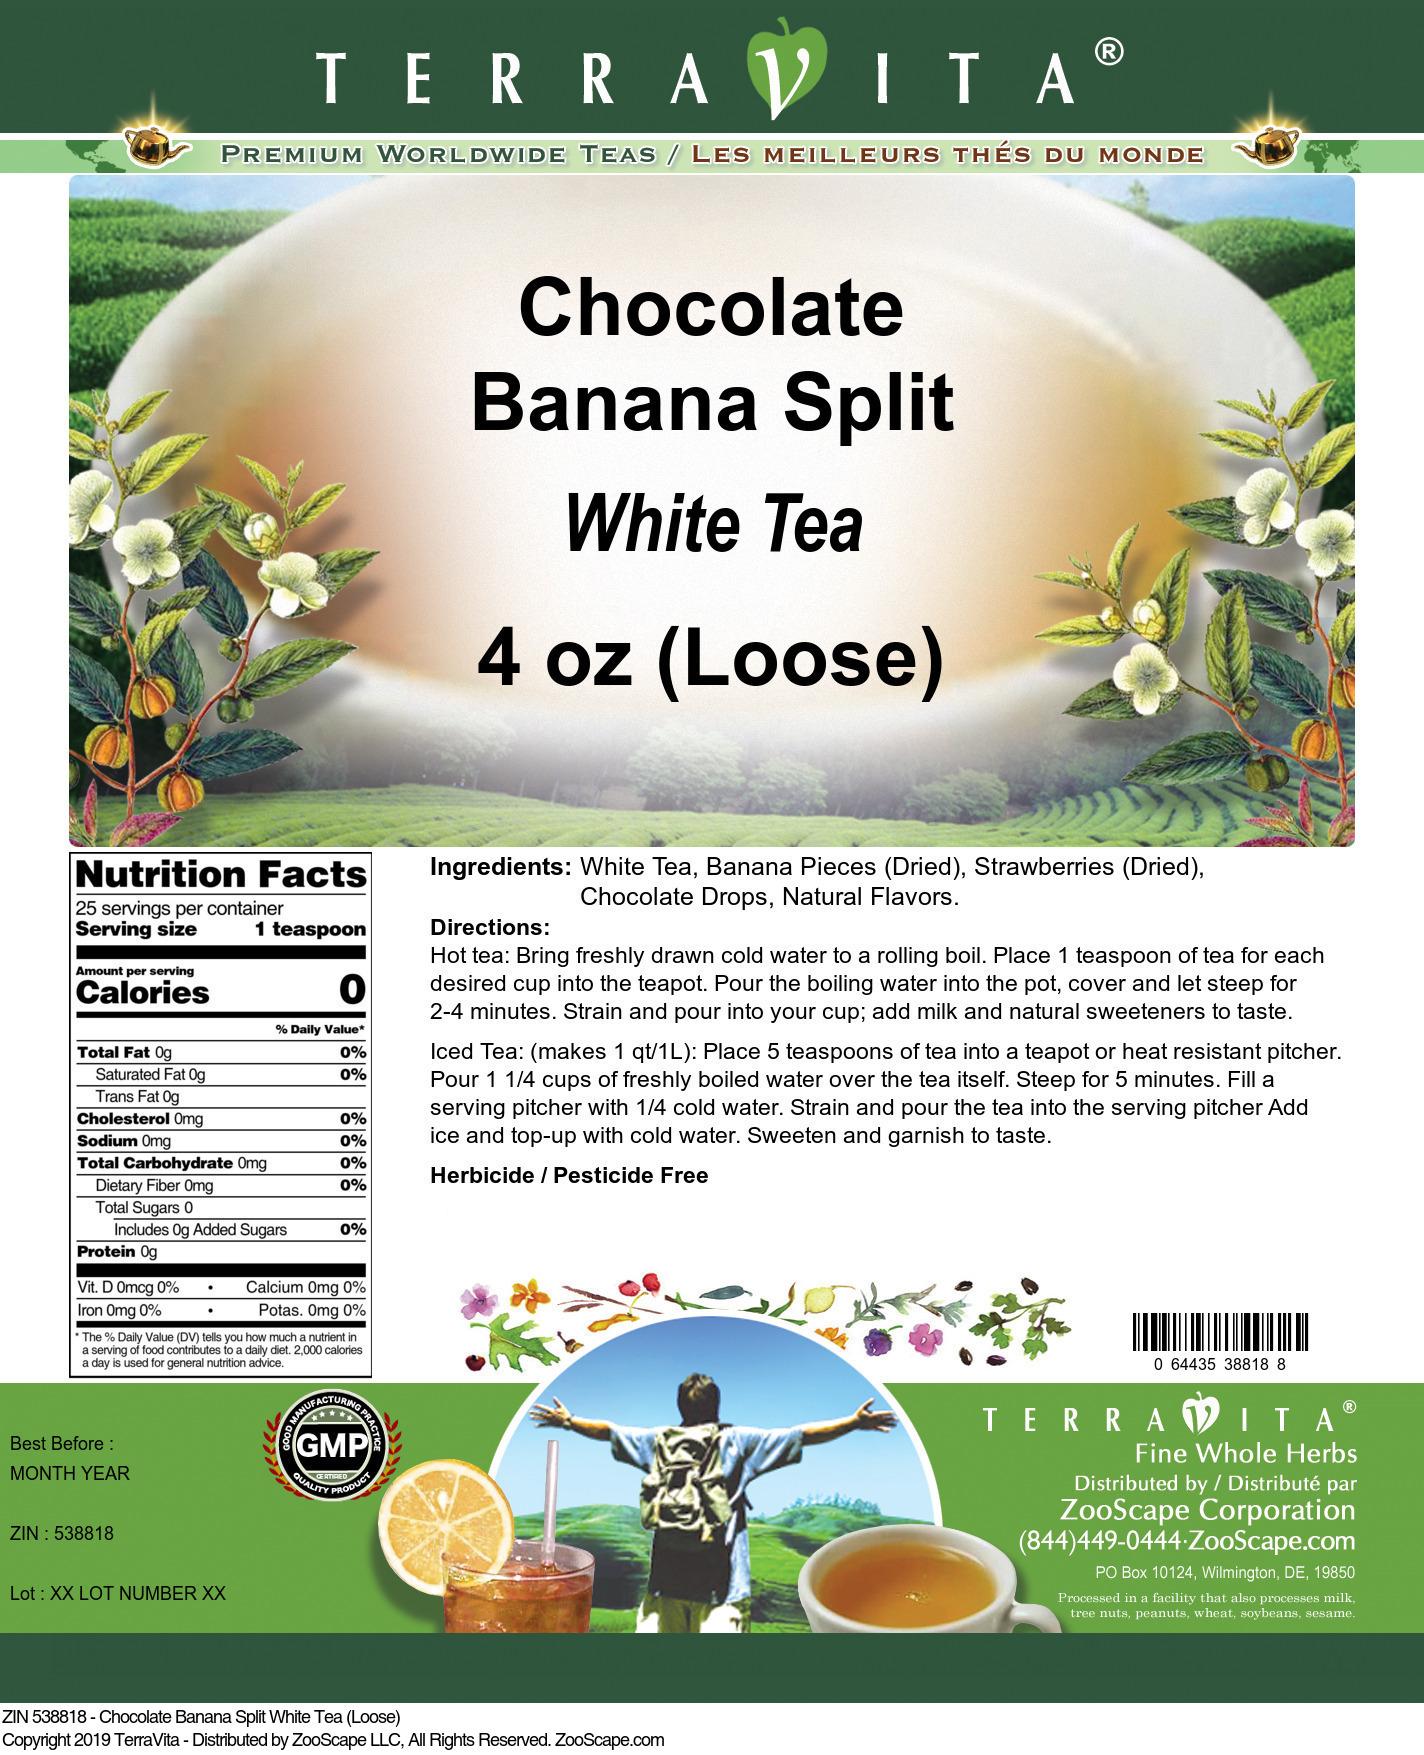 Chocolate Banana Split White Tea